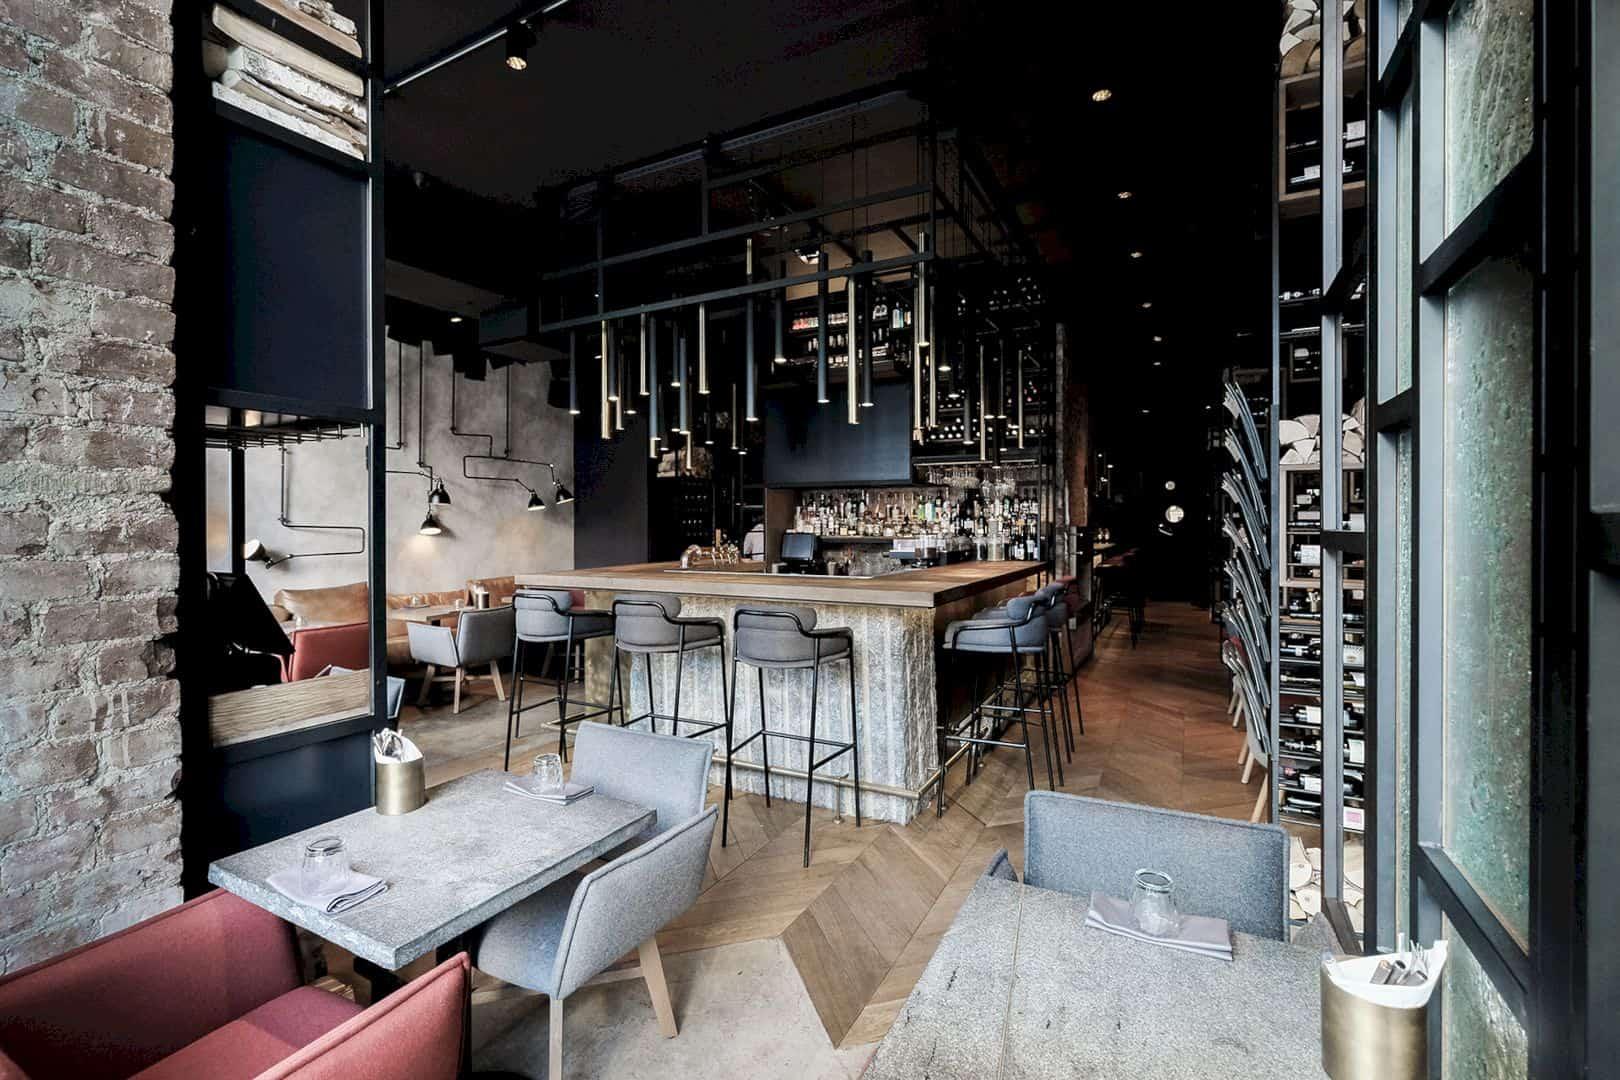 GASTROLI Bar & Kitchen: Contemporary Interior of A Cool Restaurant with Unique Lighting Design